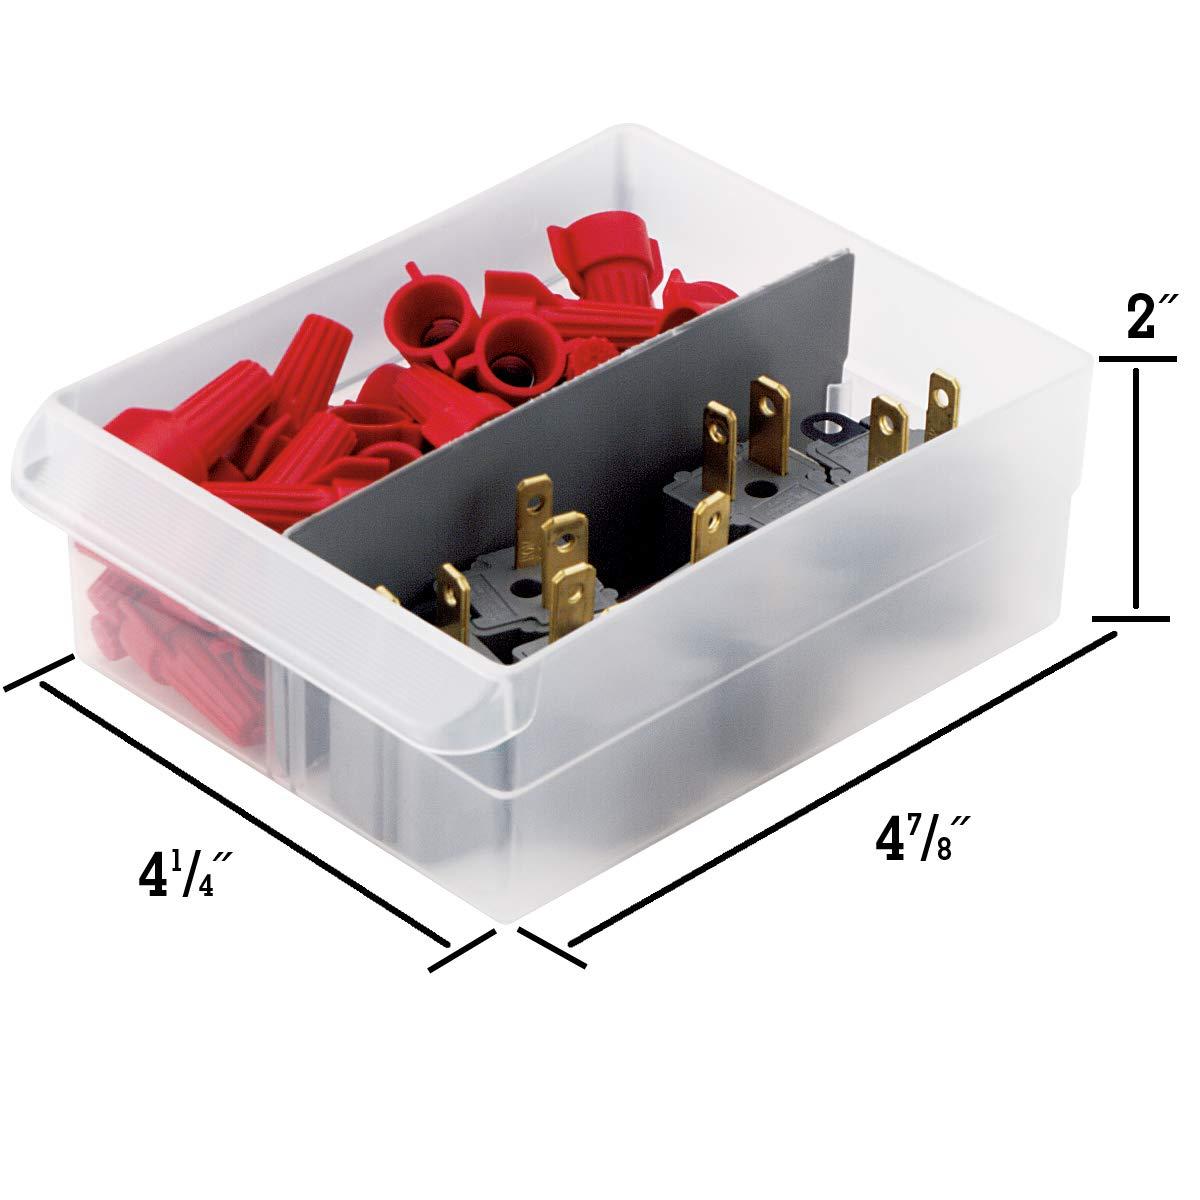 Akro-Mils 10124 24 Drawer Plastic Parts Storage Hardware and Craft Cabinet 20-Inch x 16-Inch x 6.5-Inch Black